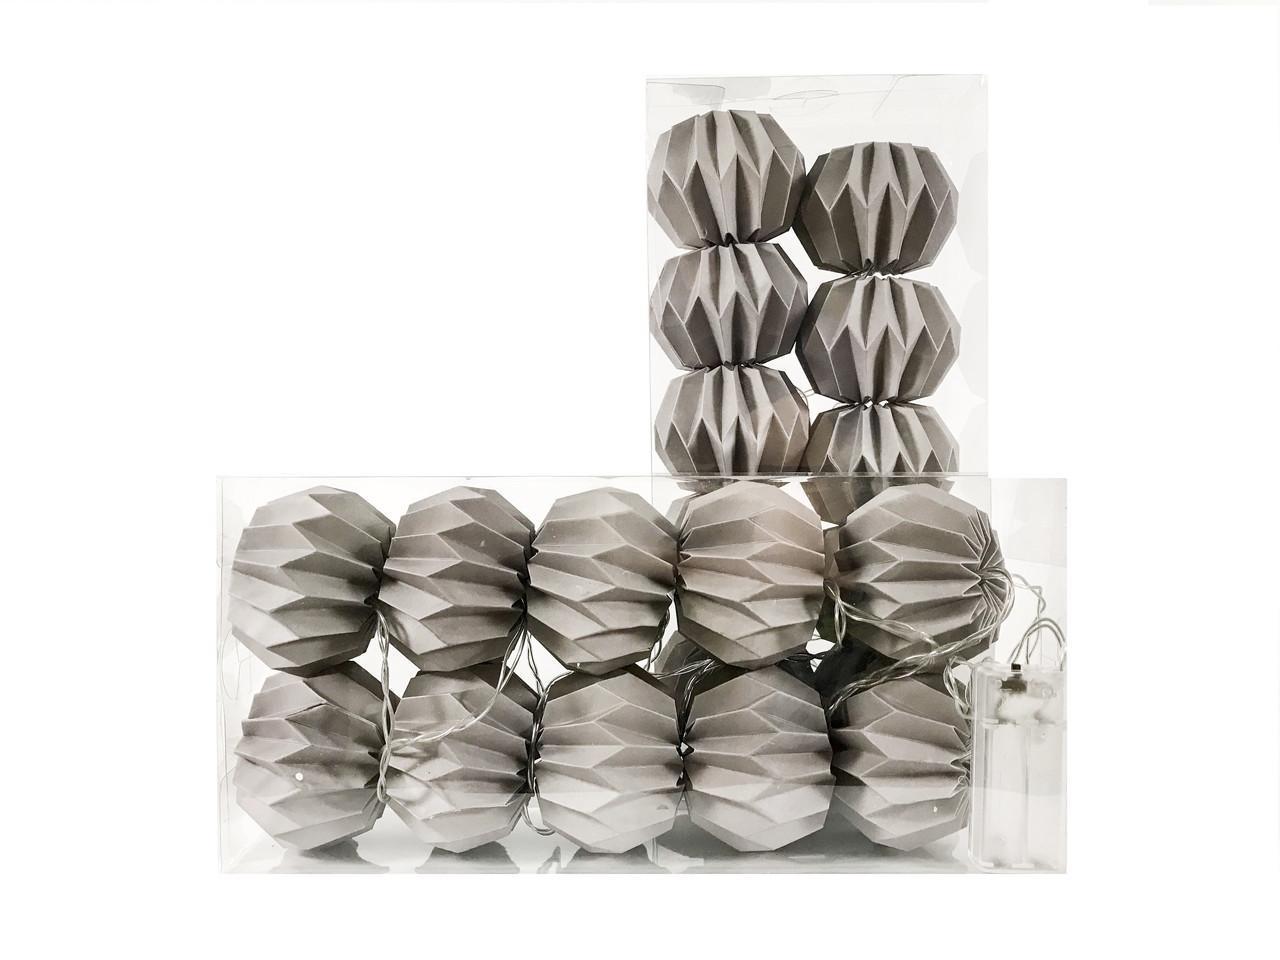 Гірлянда Decorino Grey Paper Balls 10led, діам 7.5 см, довжина 235см на батарейках АА